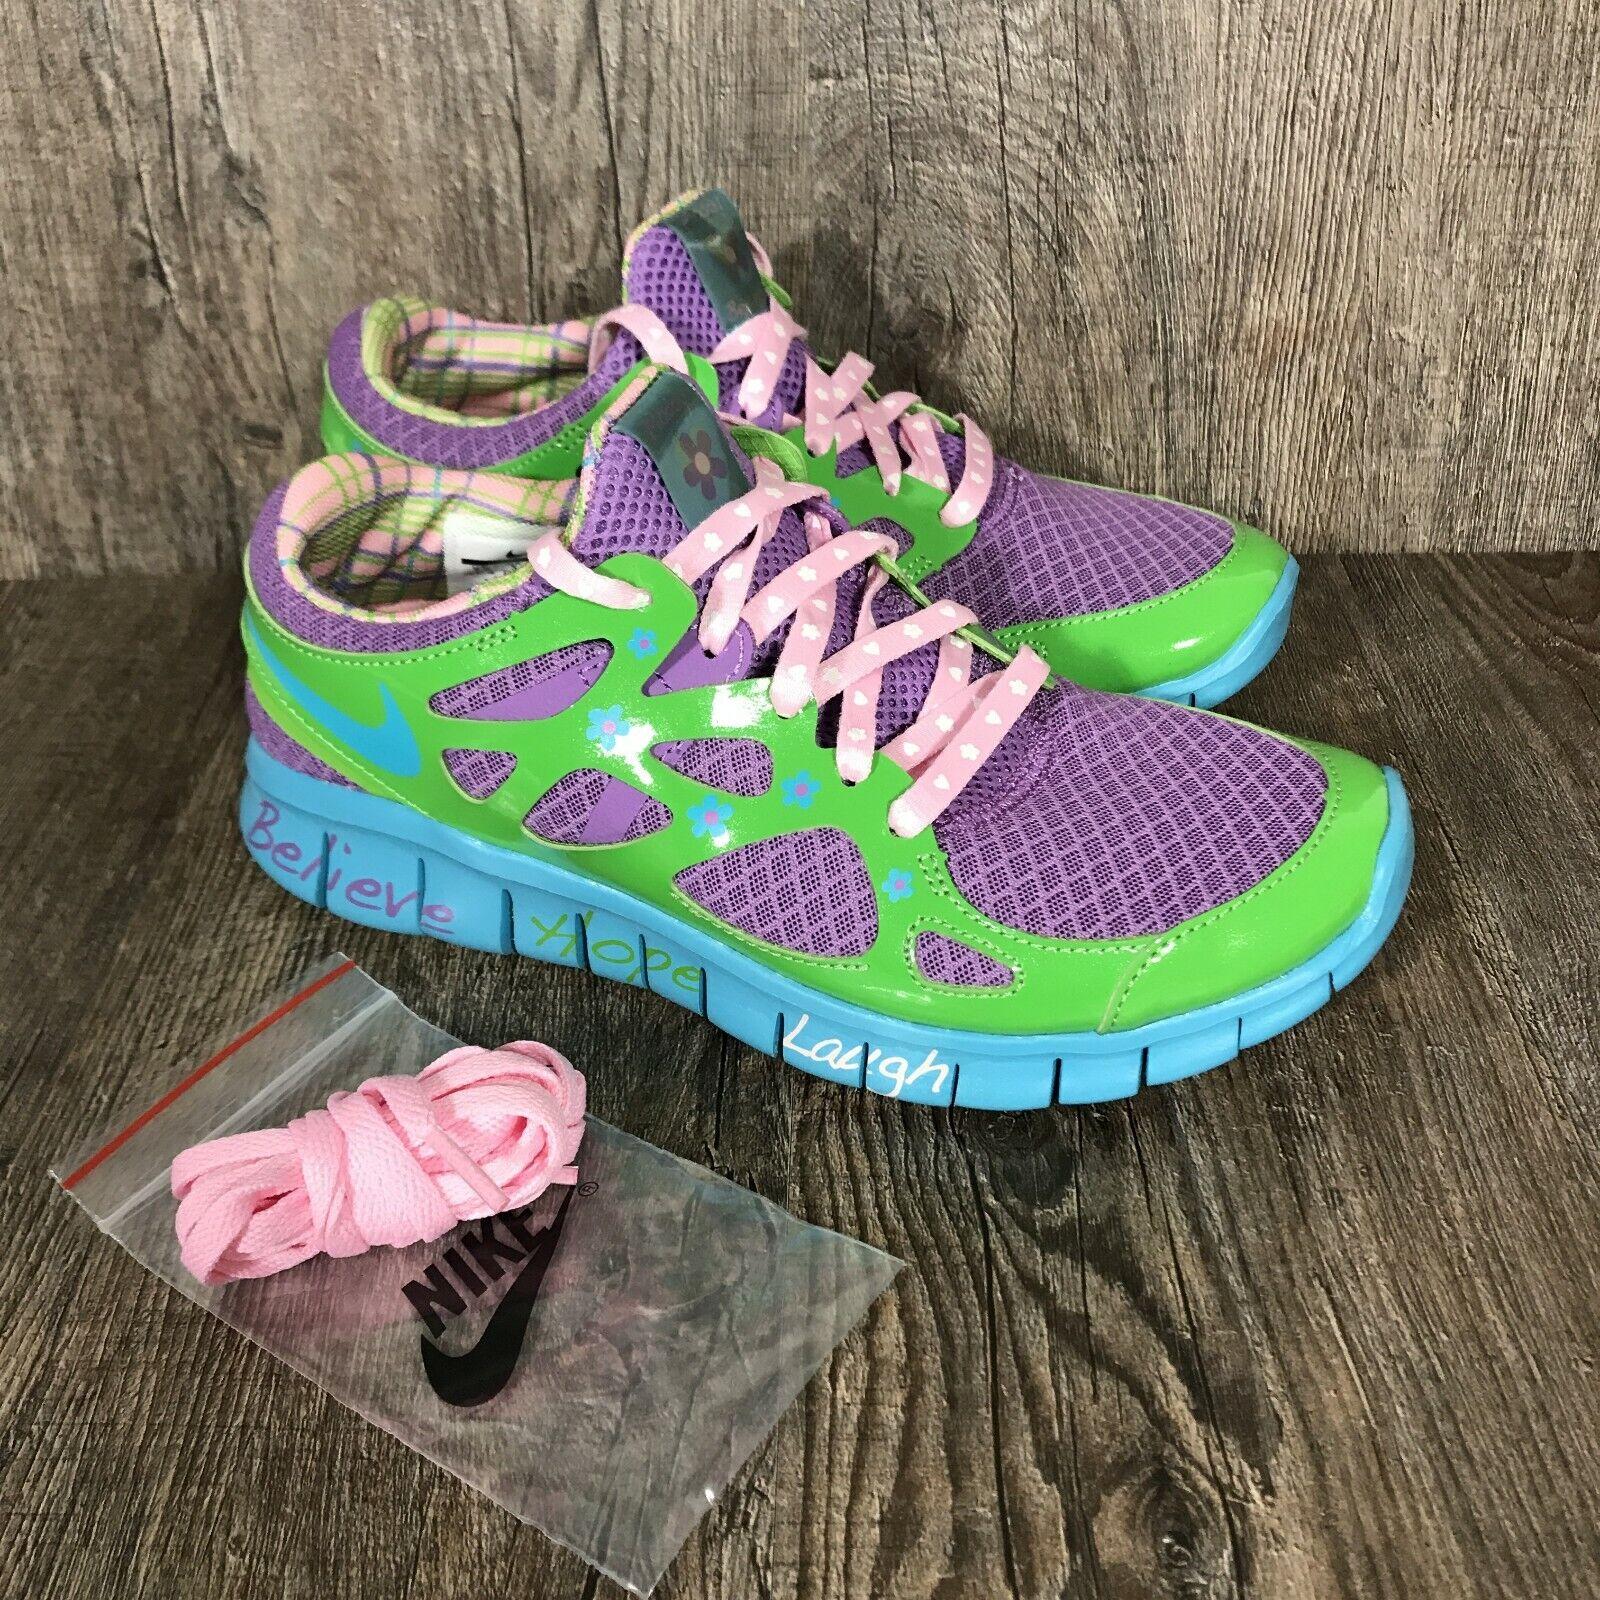 Nike Free Run+ 2 DB Doernbecher Size US Women's 7.5 437527-543 Trainer Green